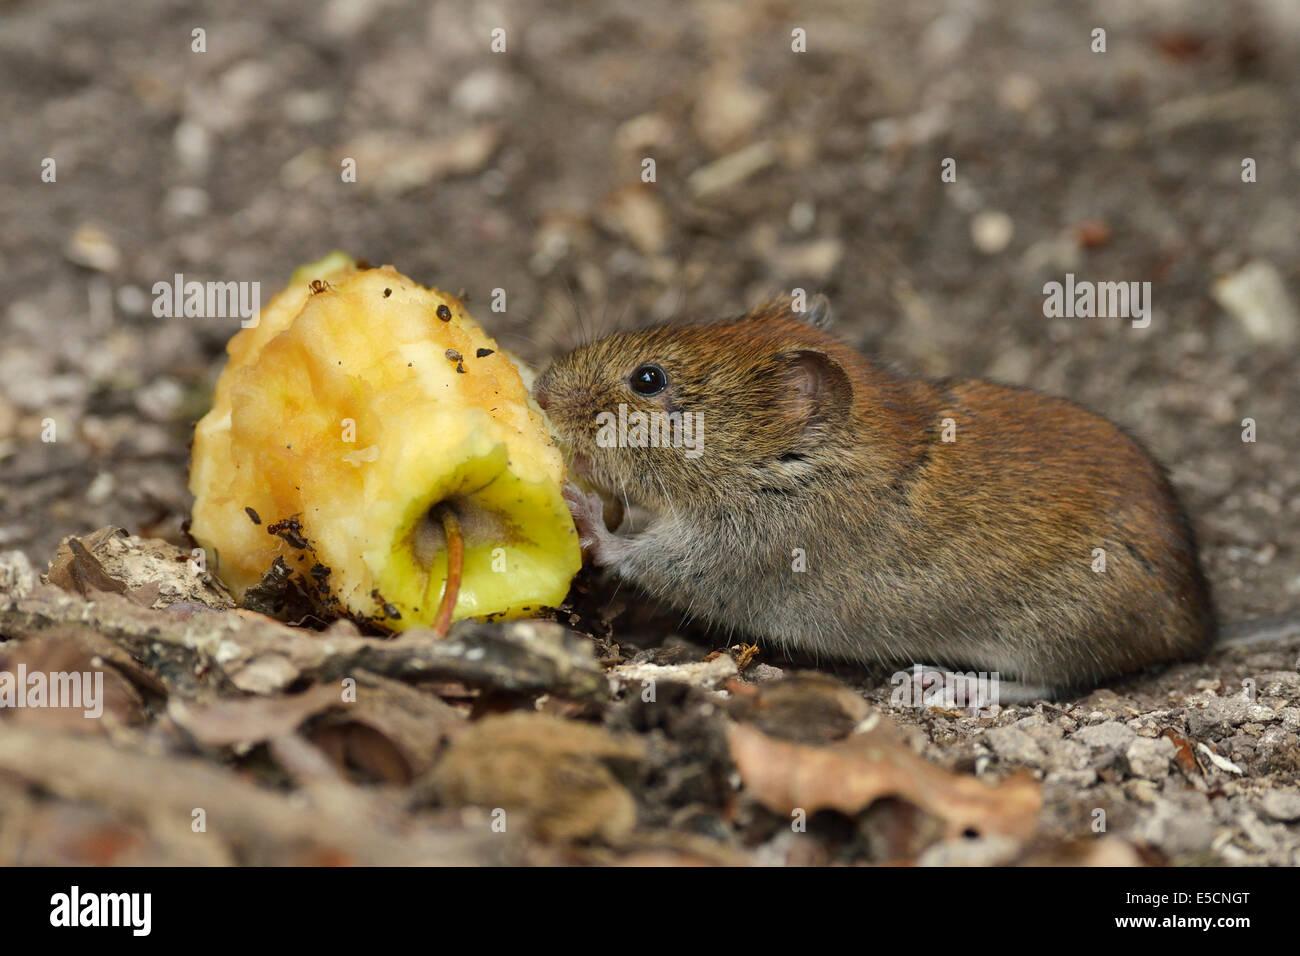 Bank vole (Myodes glareolus) eating an apple cores, Croatia Stock Photo